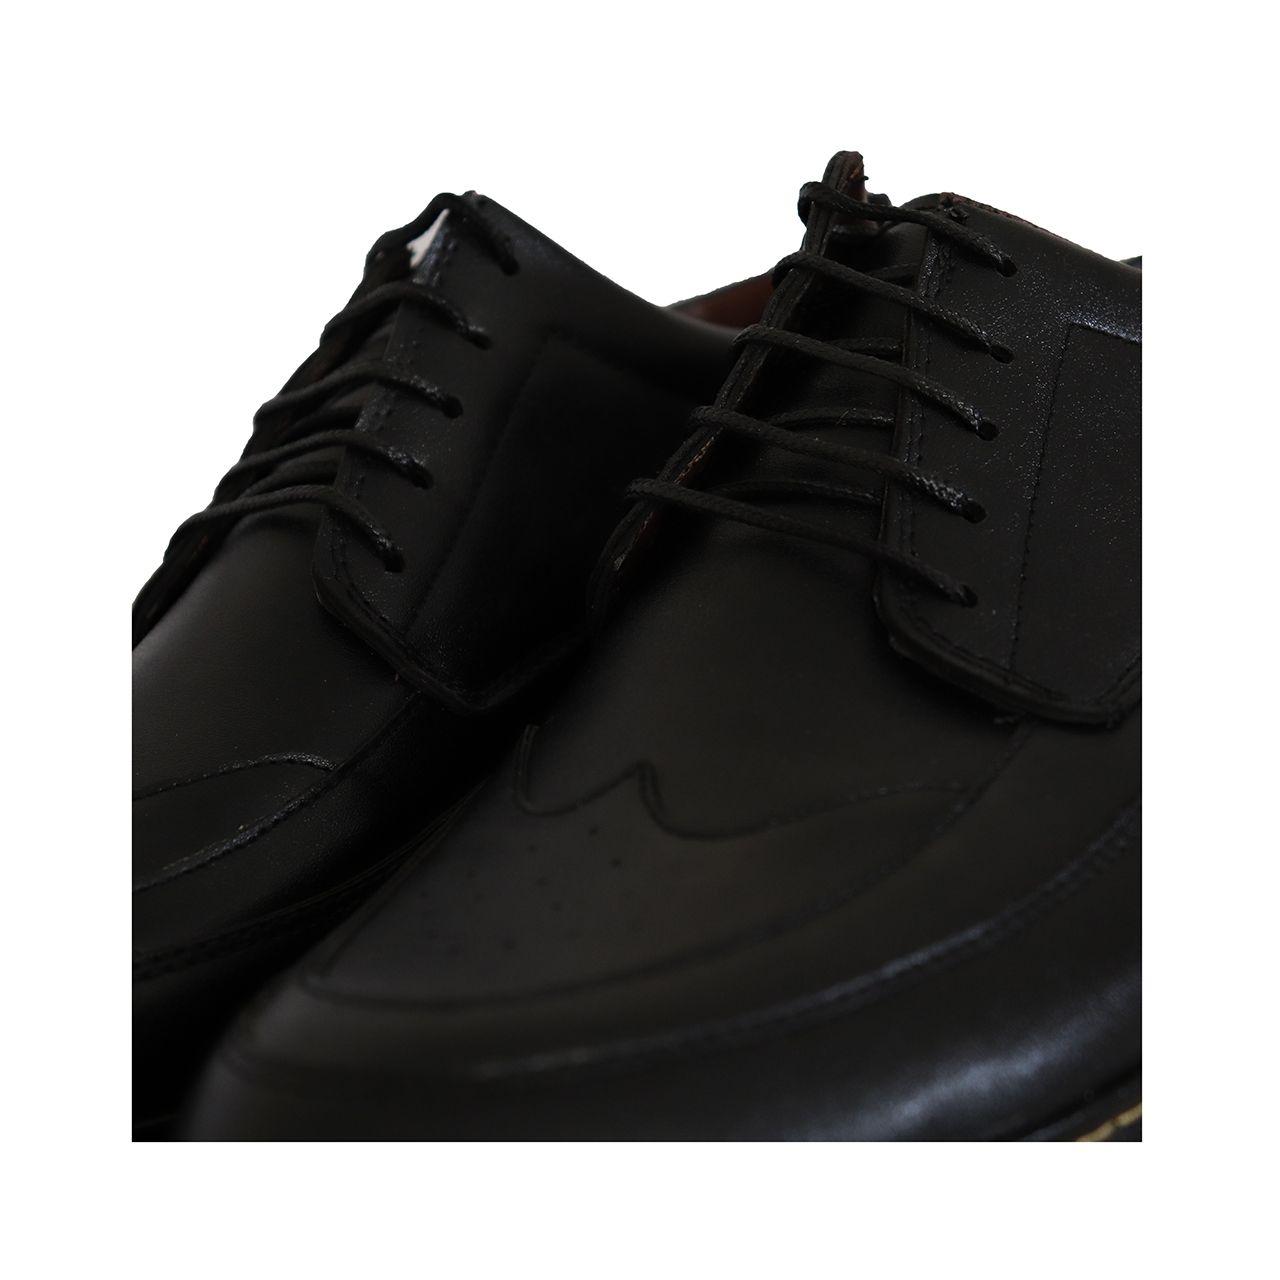 کفش روزمره مردانه مدل 846 -  - 1